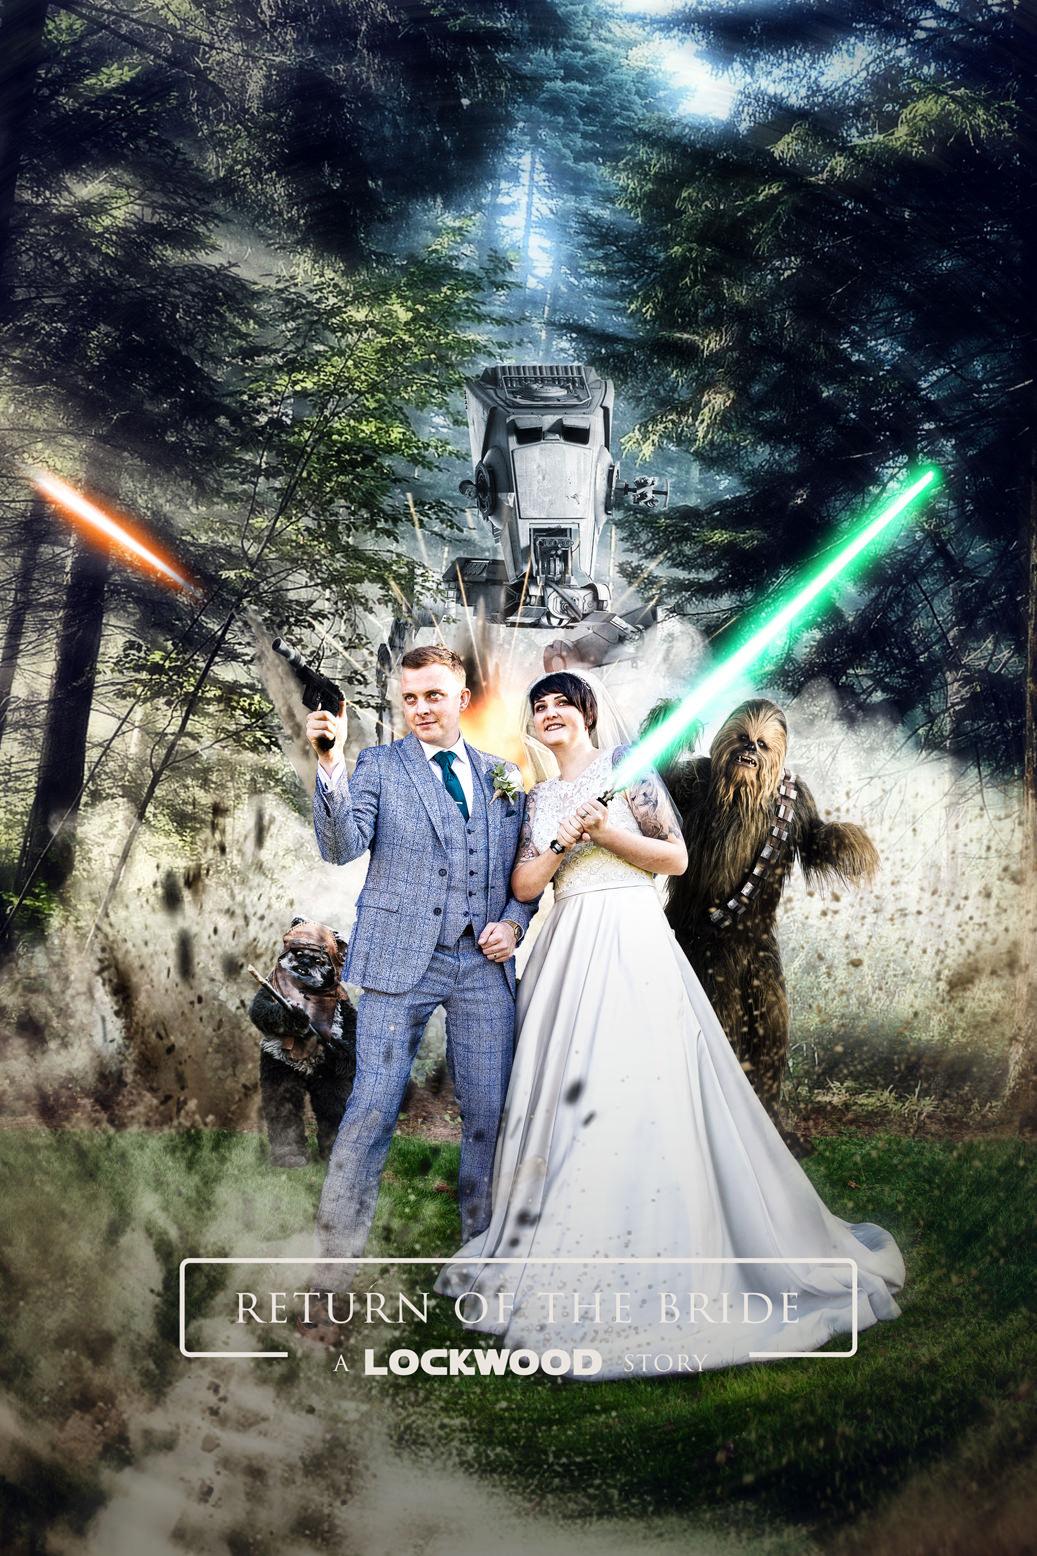 Star Wars Return of the Jedi wedding photo